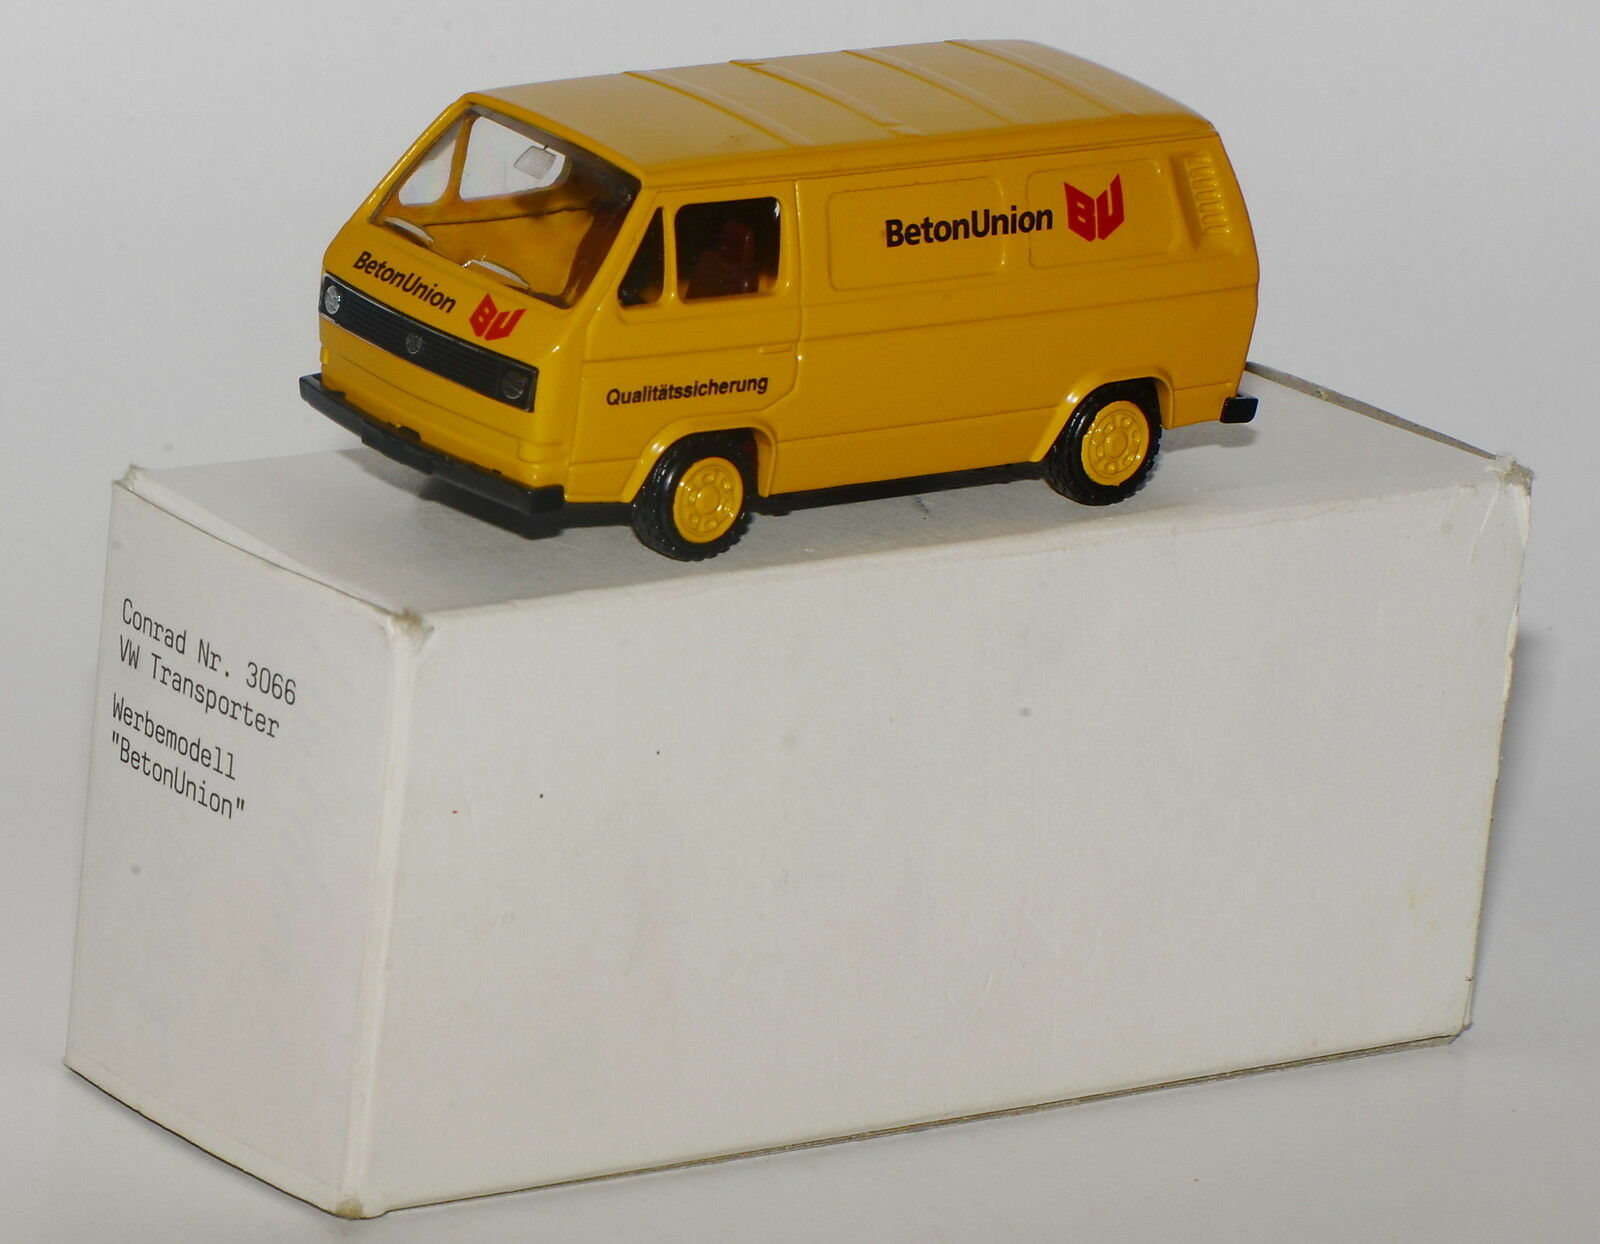 Conrad Scale 1 43 - Werbemodell - VW T3 Transporter  Beton-Union  in OVP-mint  2  | Outlet